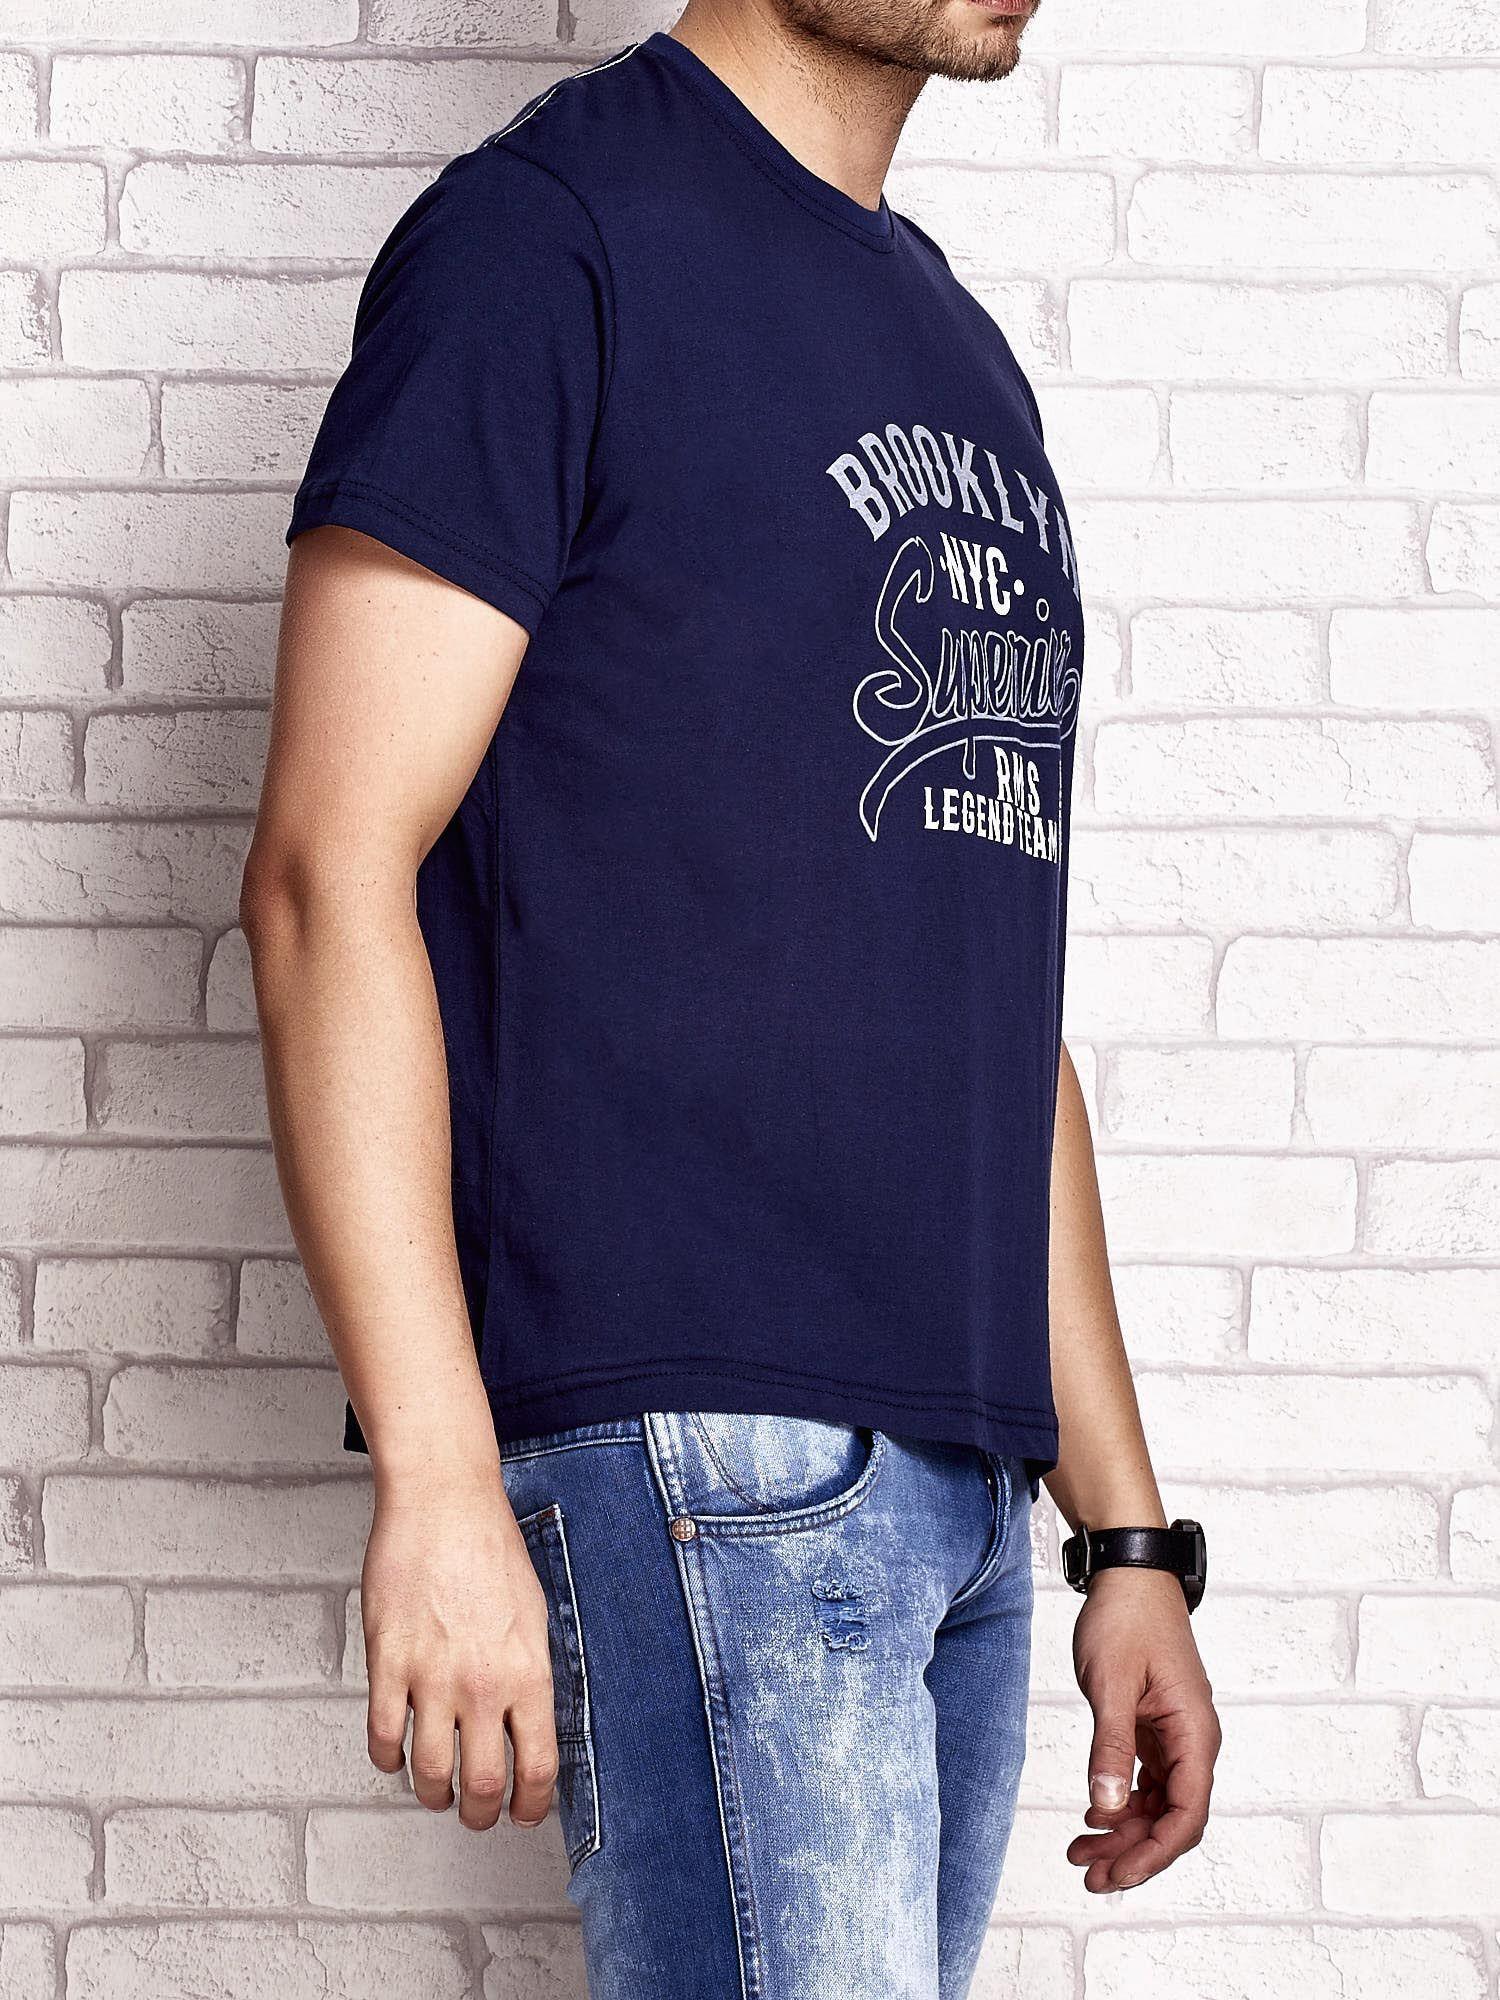 Granatowy t-shirt męski z napisem BROOKLYN NYC                                  zdj.                                  3